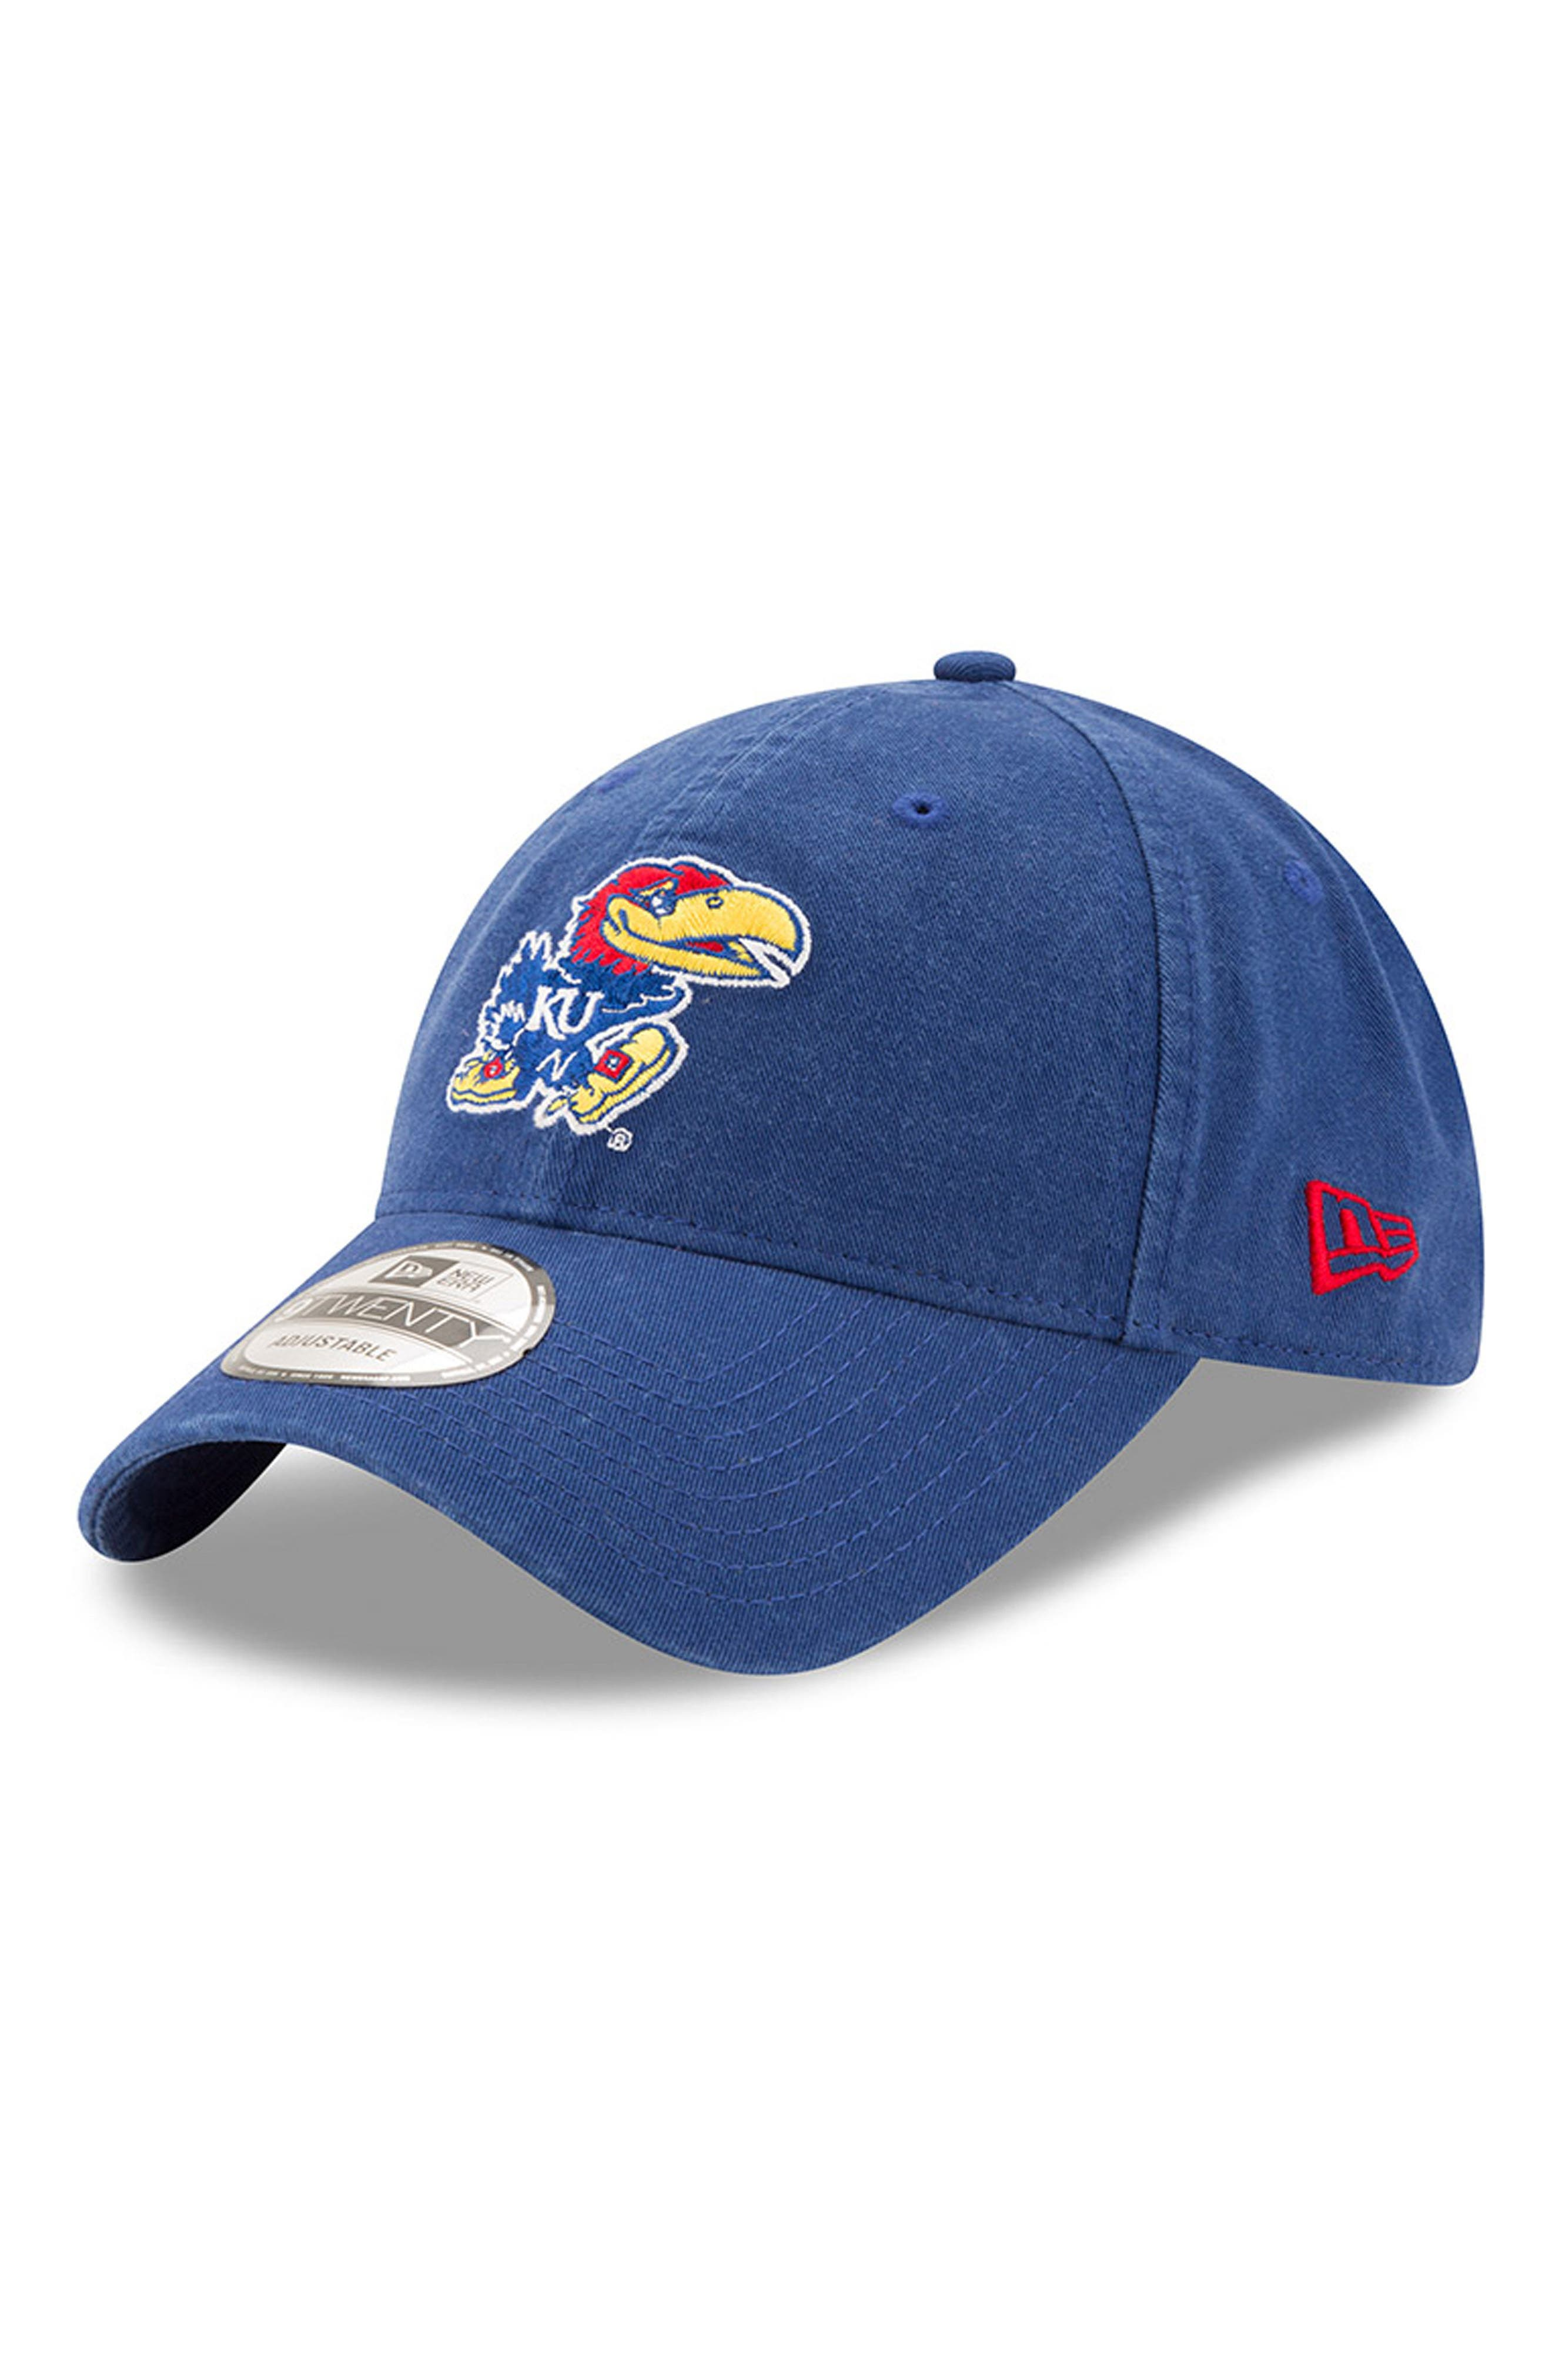 New Era Collegiate Core Classic - Kansas Jayhawks Baseball Cap,                         Main,                         color, 400